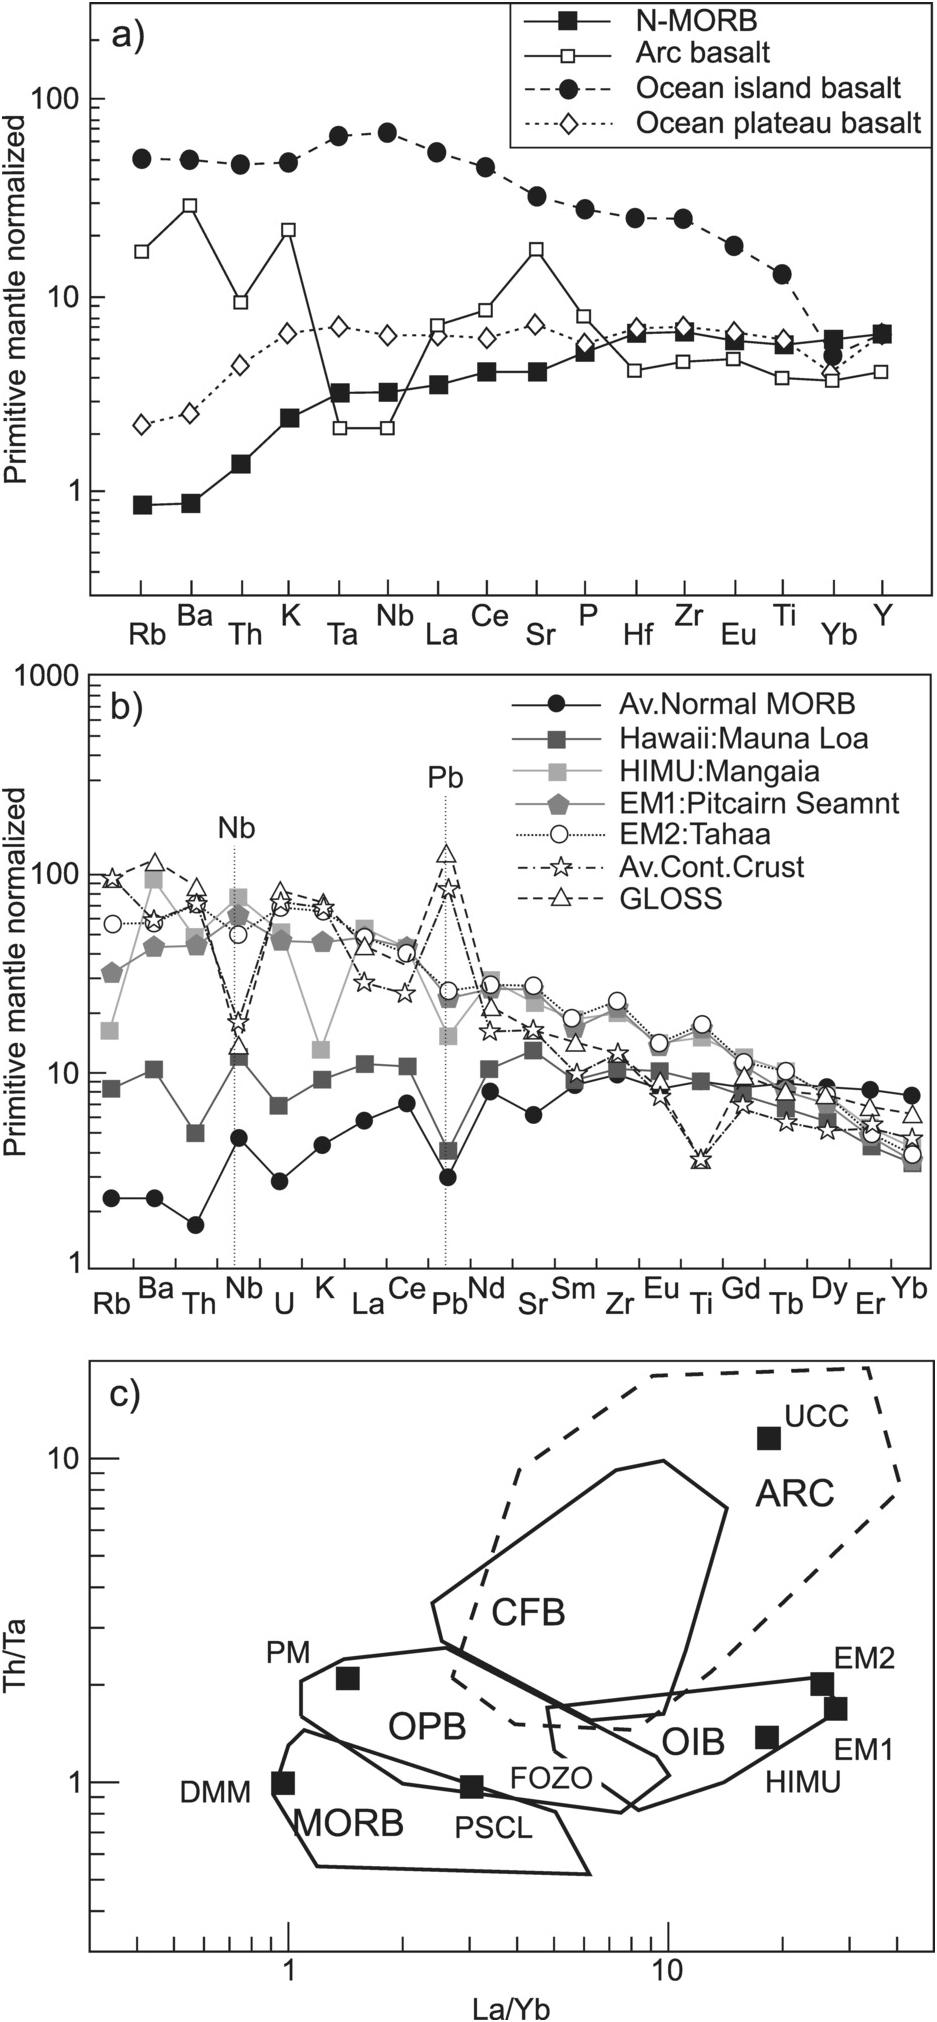 Geochemistry of LIPs (Chapter 10) - Large Igneous Provinces